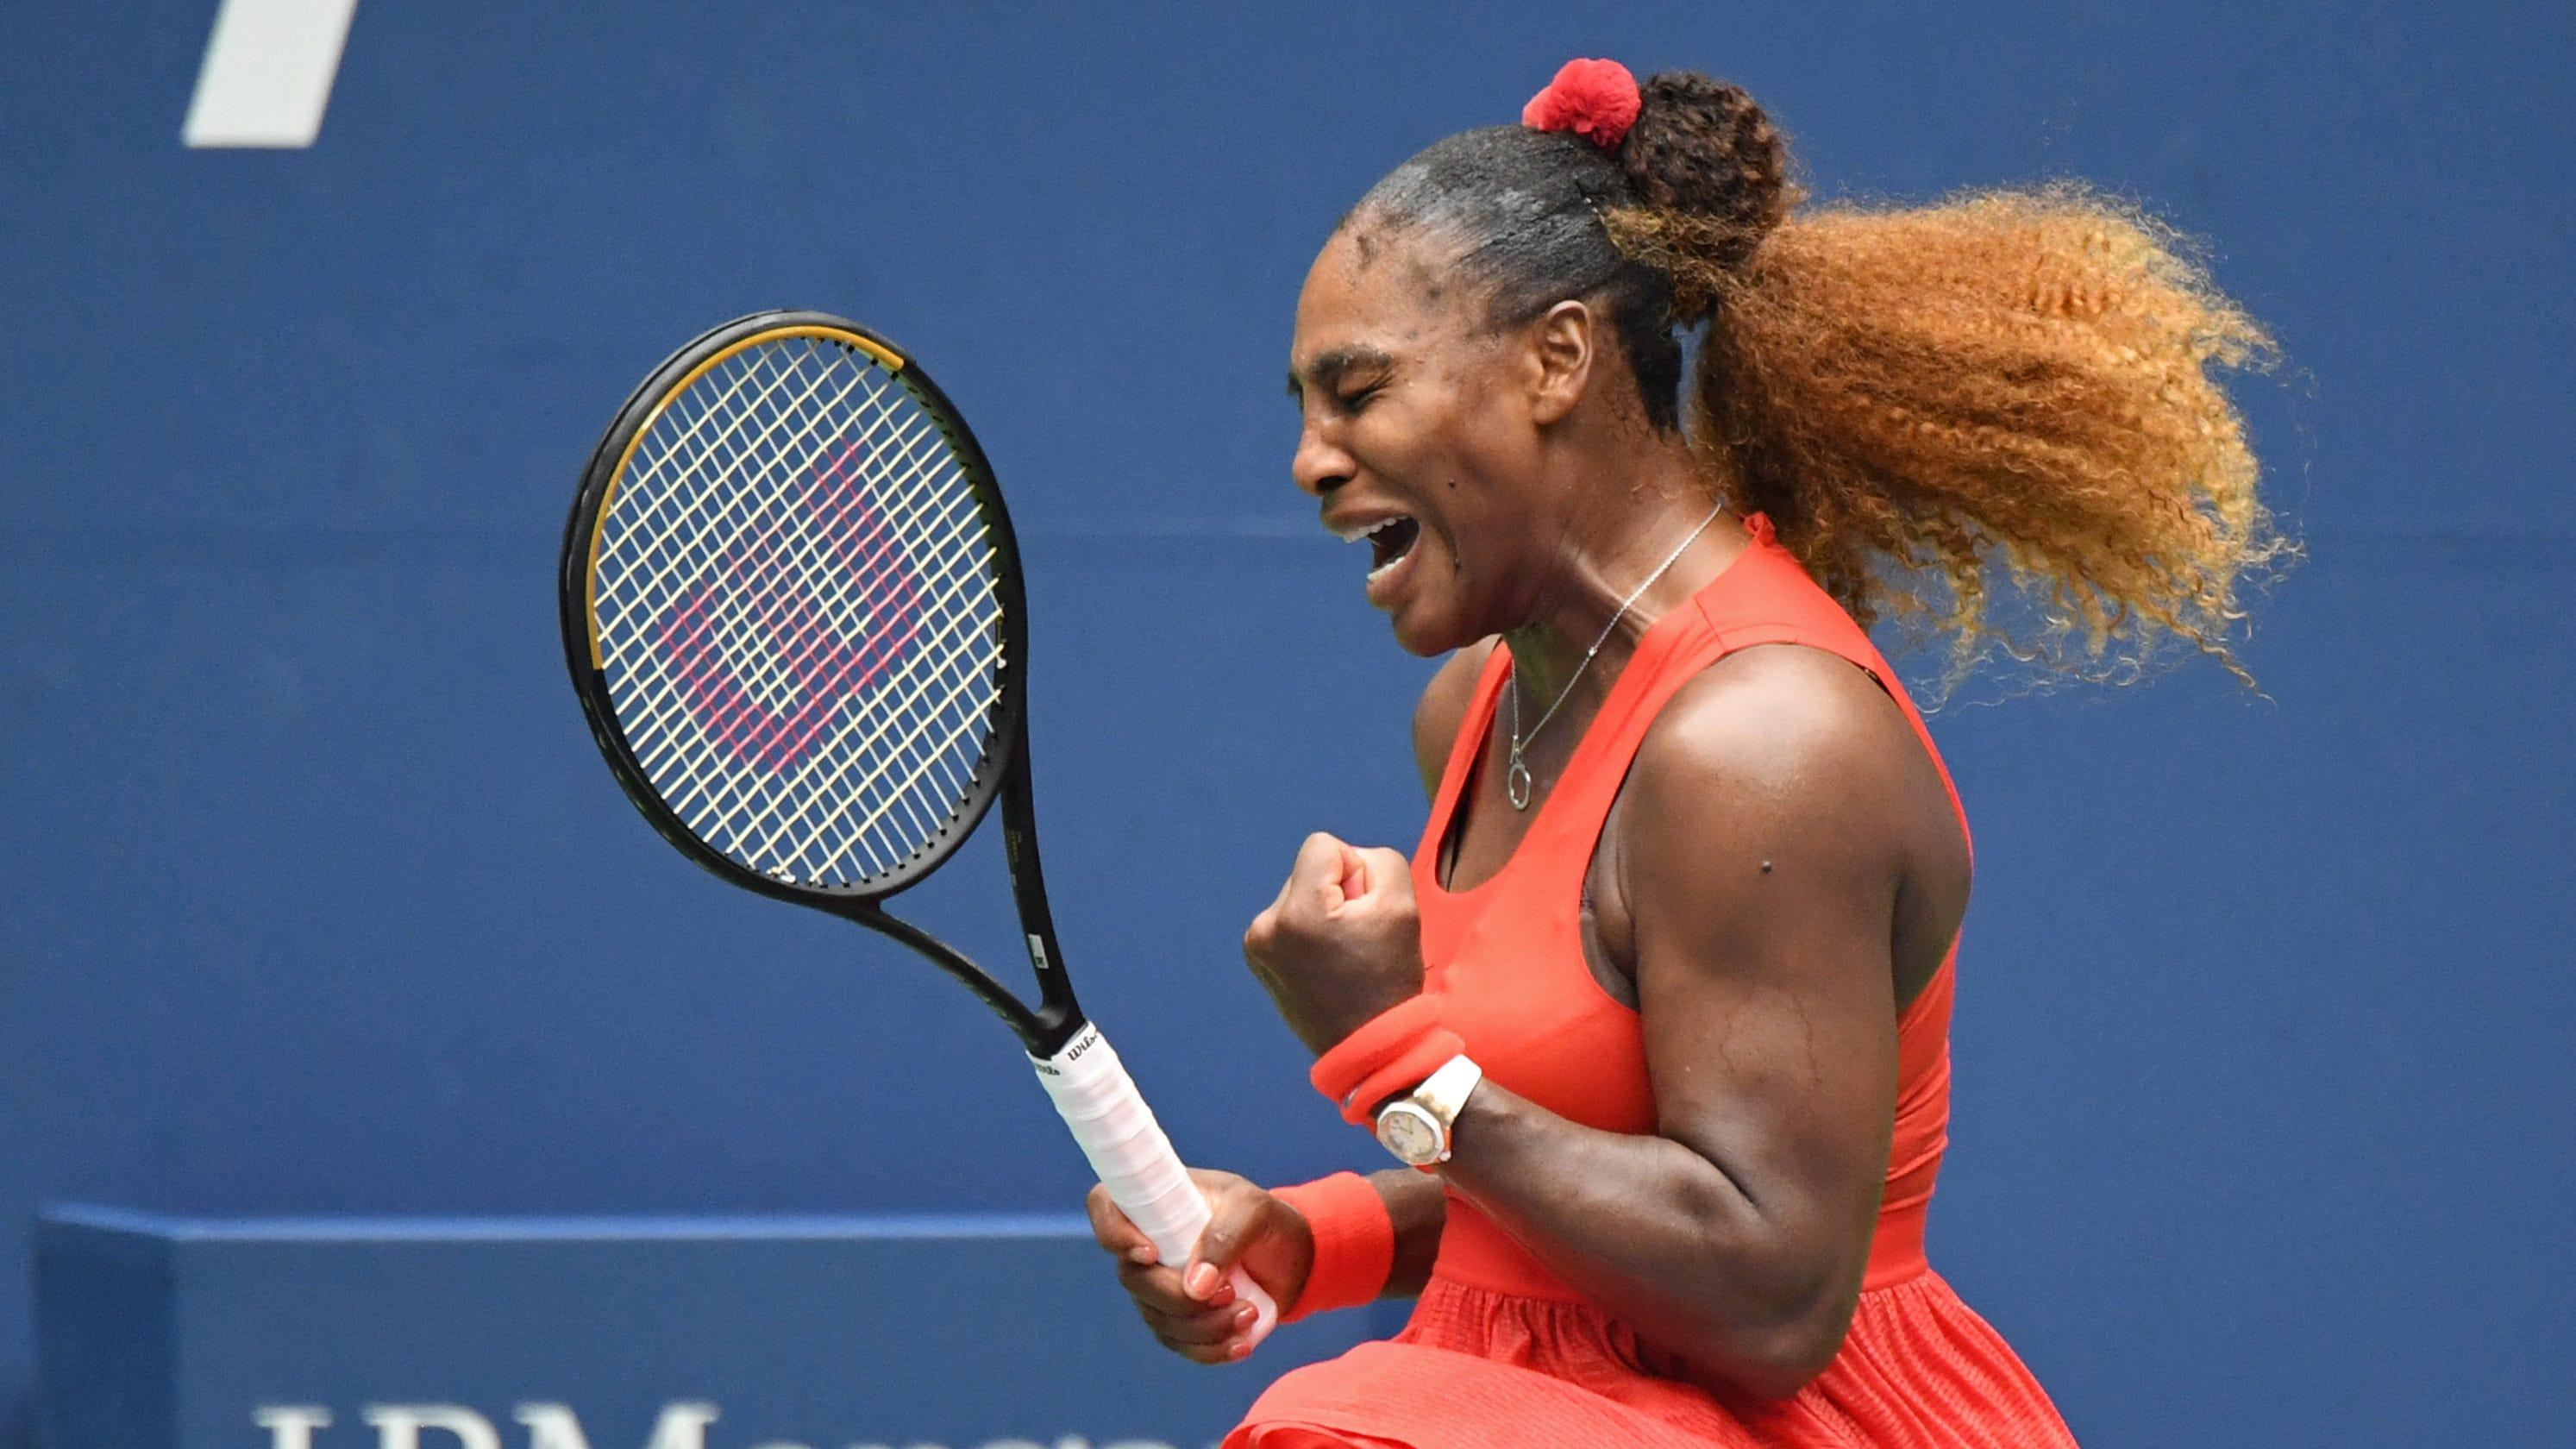 Serena Williams reaches U.S. Open semis with win vs. Tsvetana Pironkova